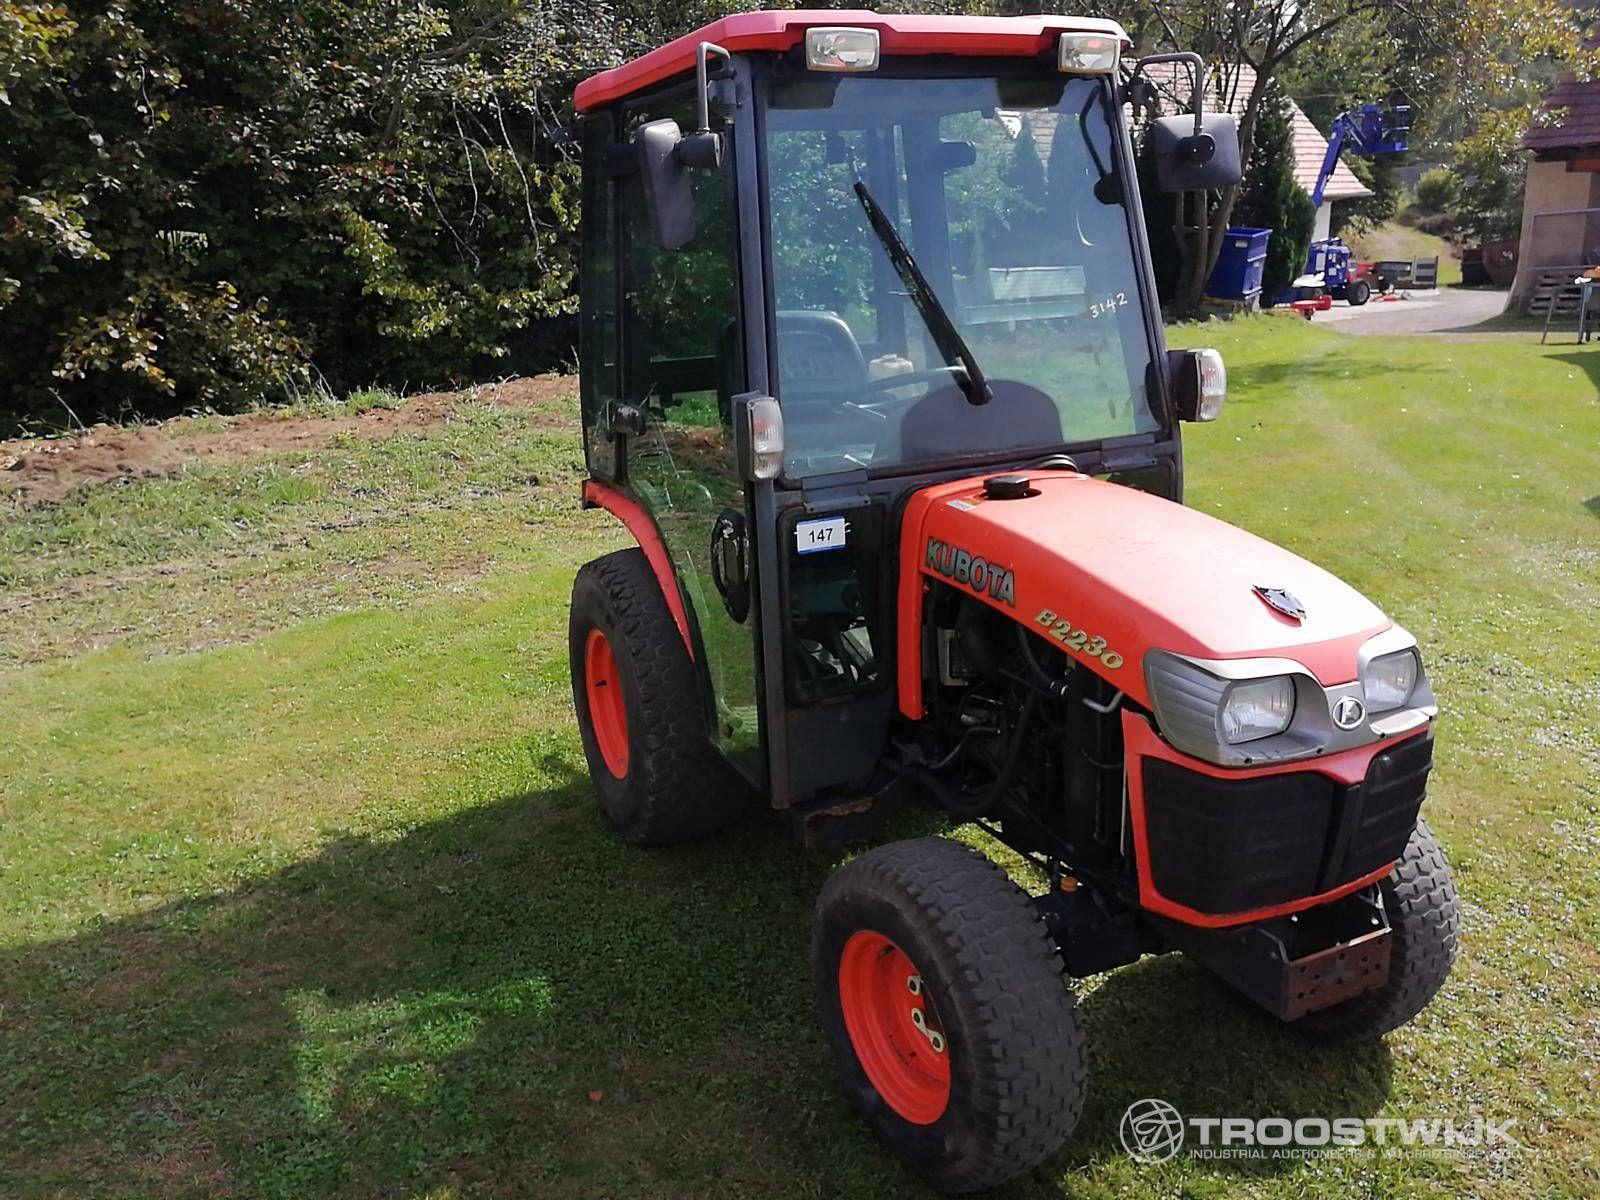 4-Wheel Drive Tractor